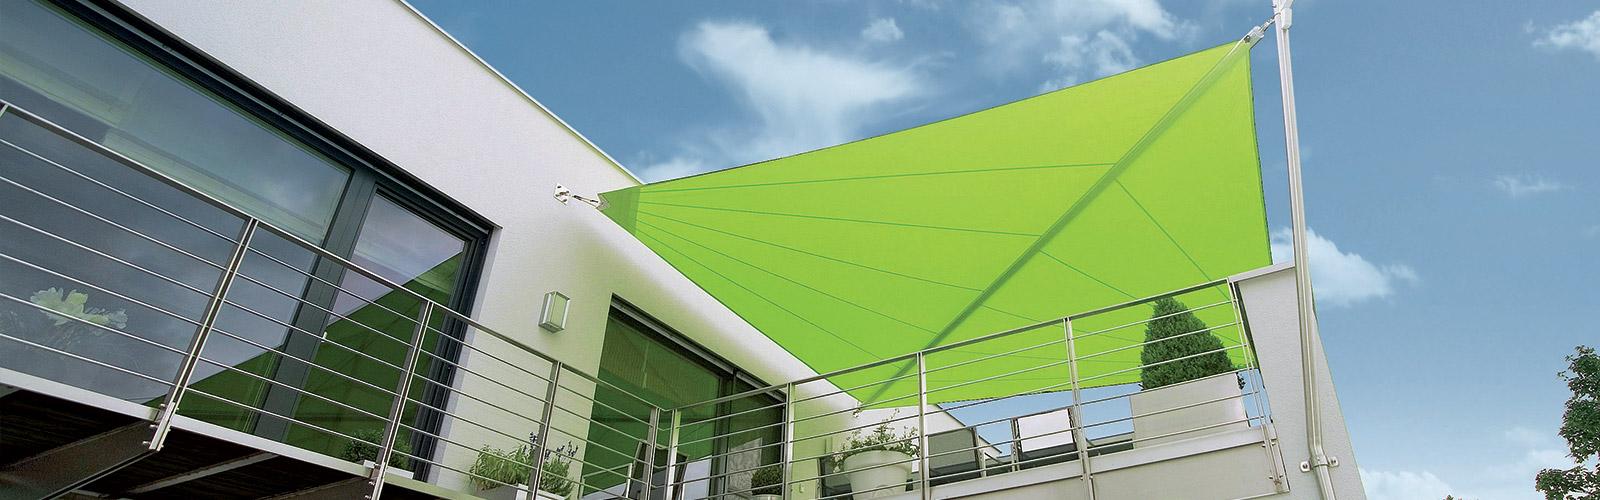 sonnensegel wintergarten, sonnenschutz - zimmermann sonnenschutzsysteme berlin, Design ideen